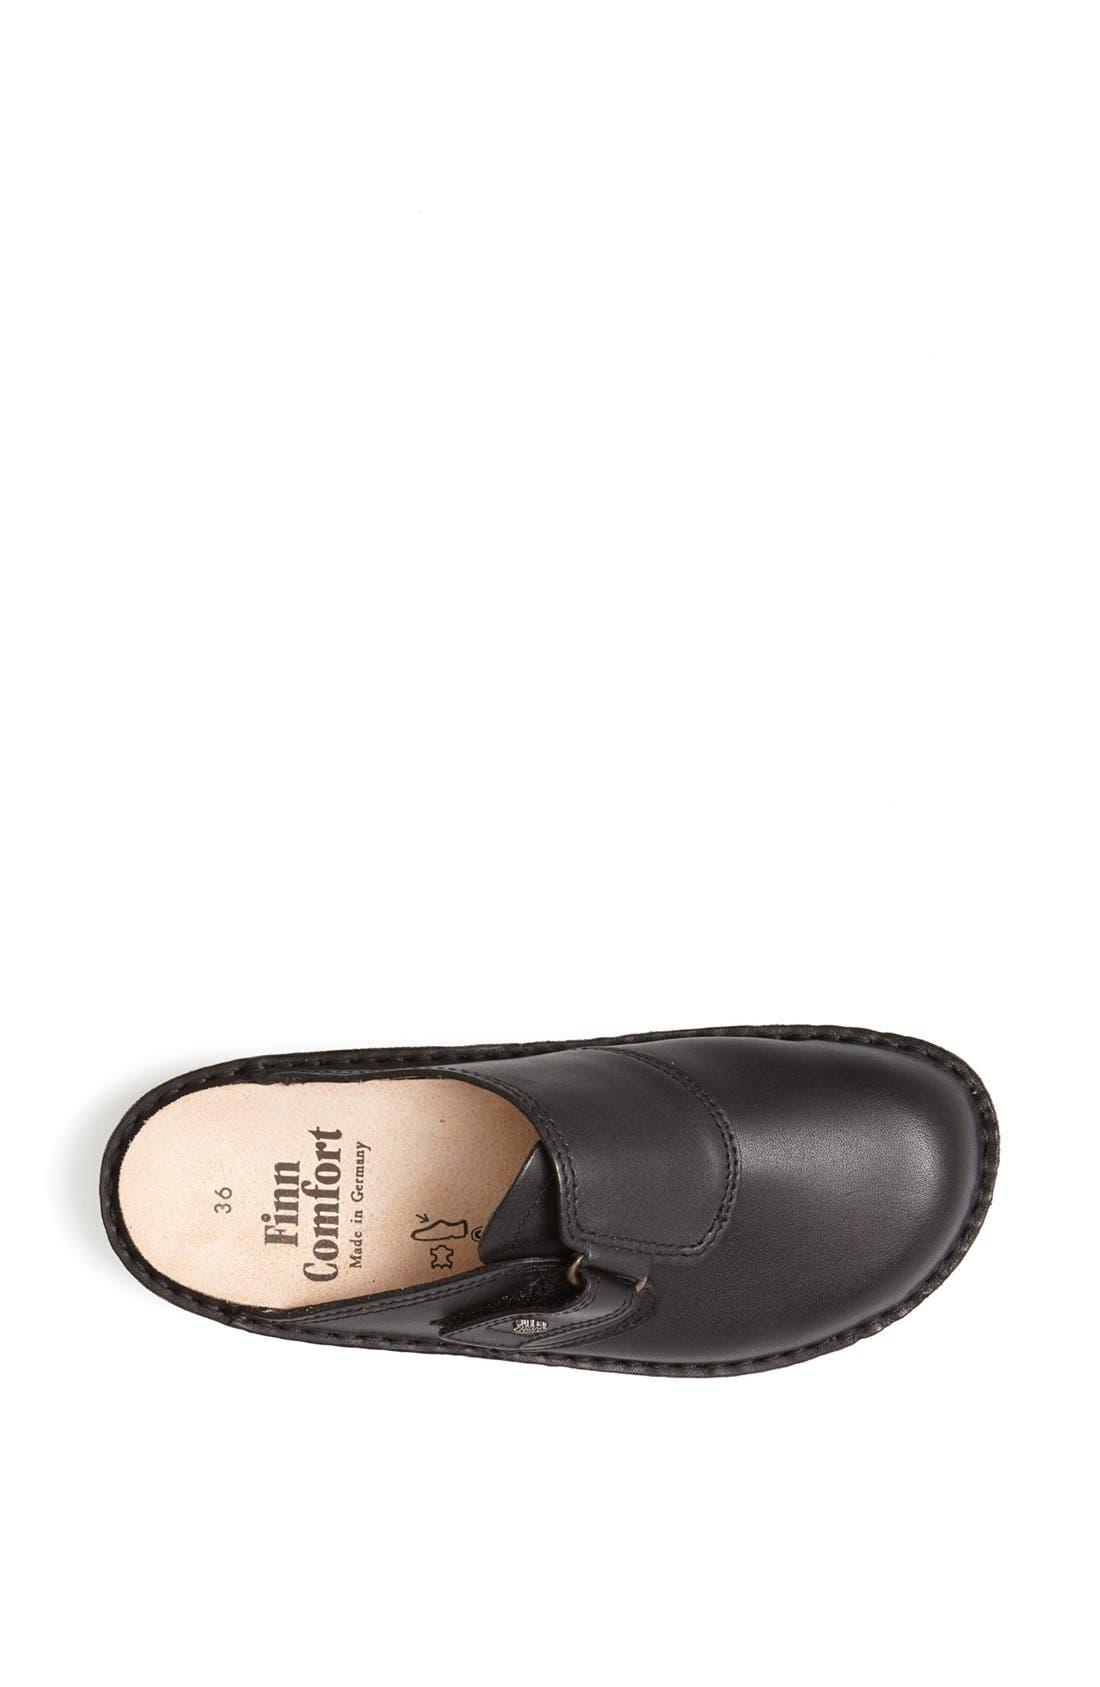 'Venice' Leather Clog,                             Alternate thumbnail 3, color,                             Black